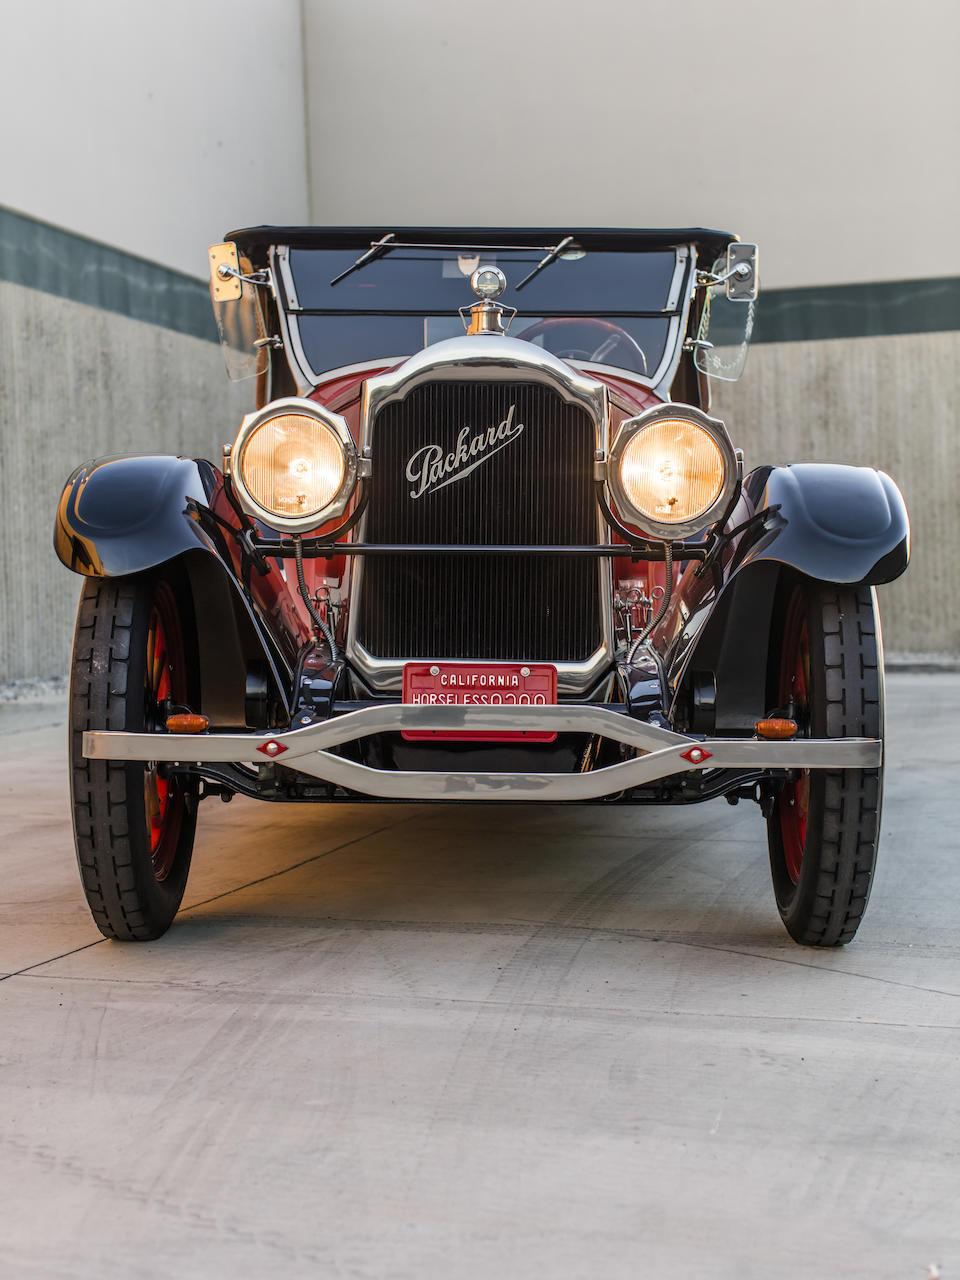 <b>1922 Packard Single Six 223 Runabout</b><br />Chassis no. U22272A<br />Engine no. U22469